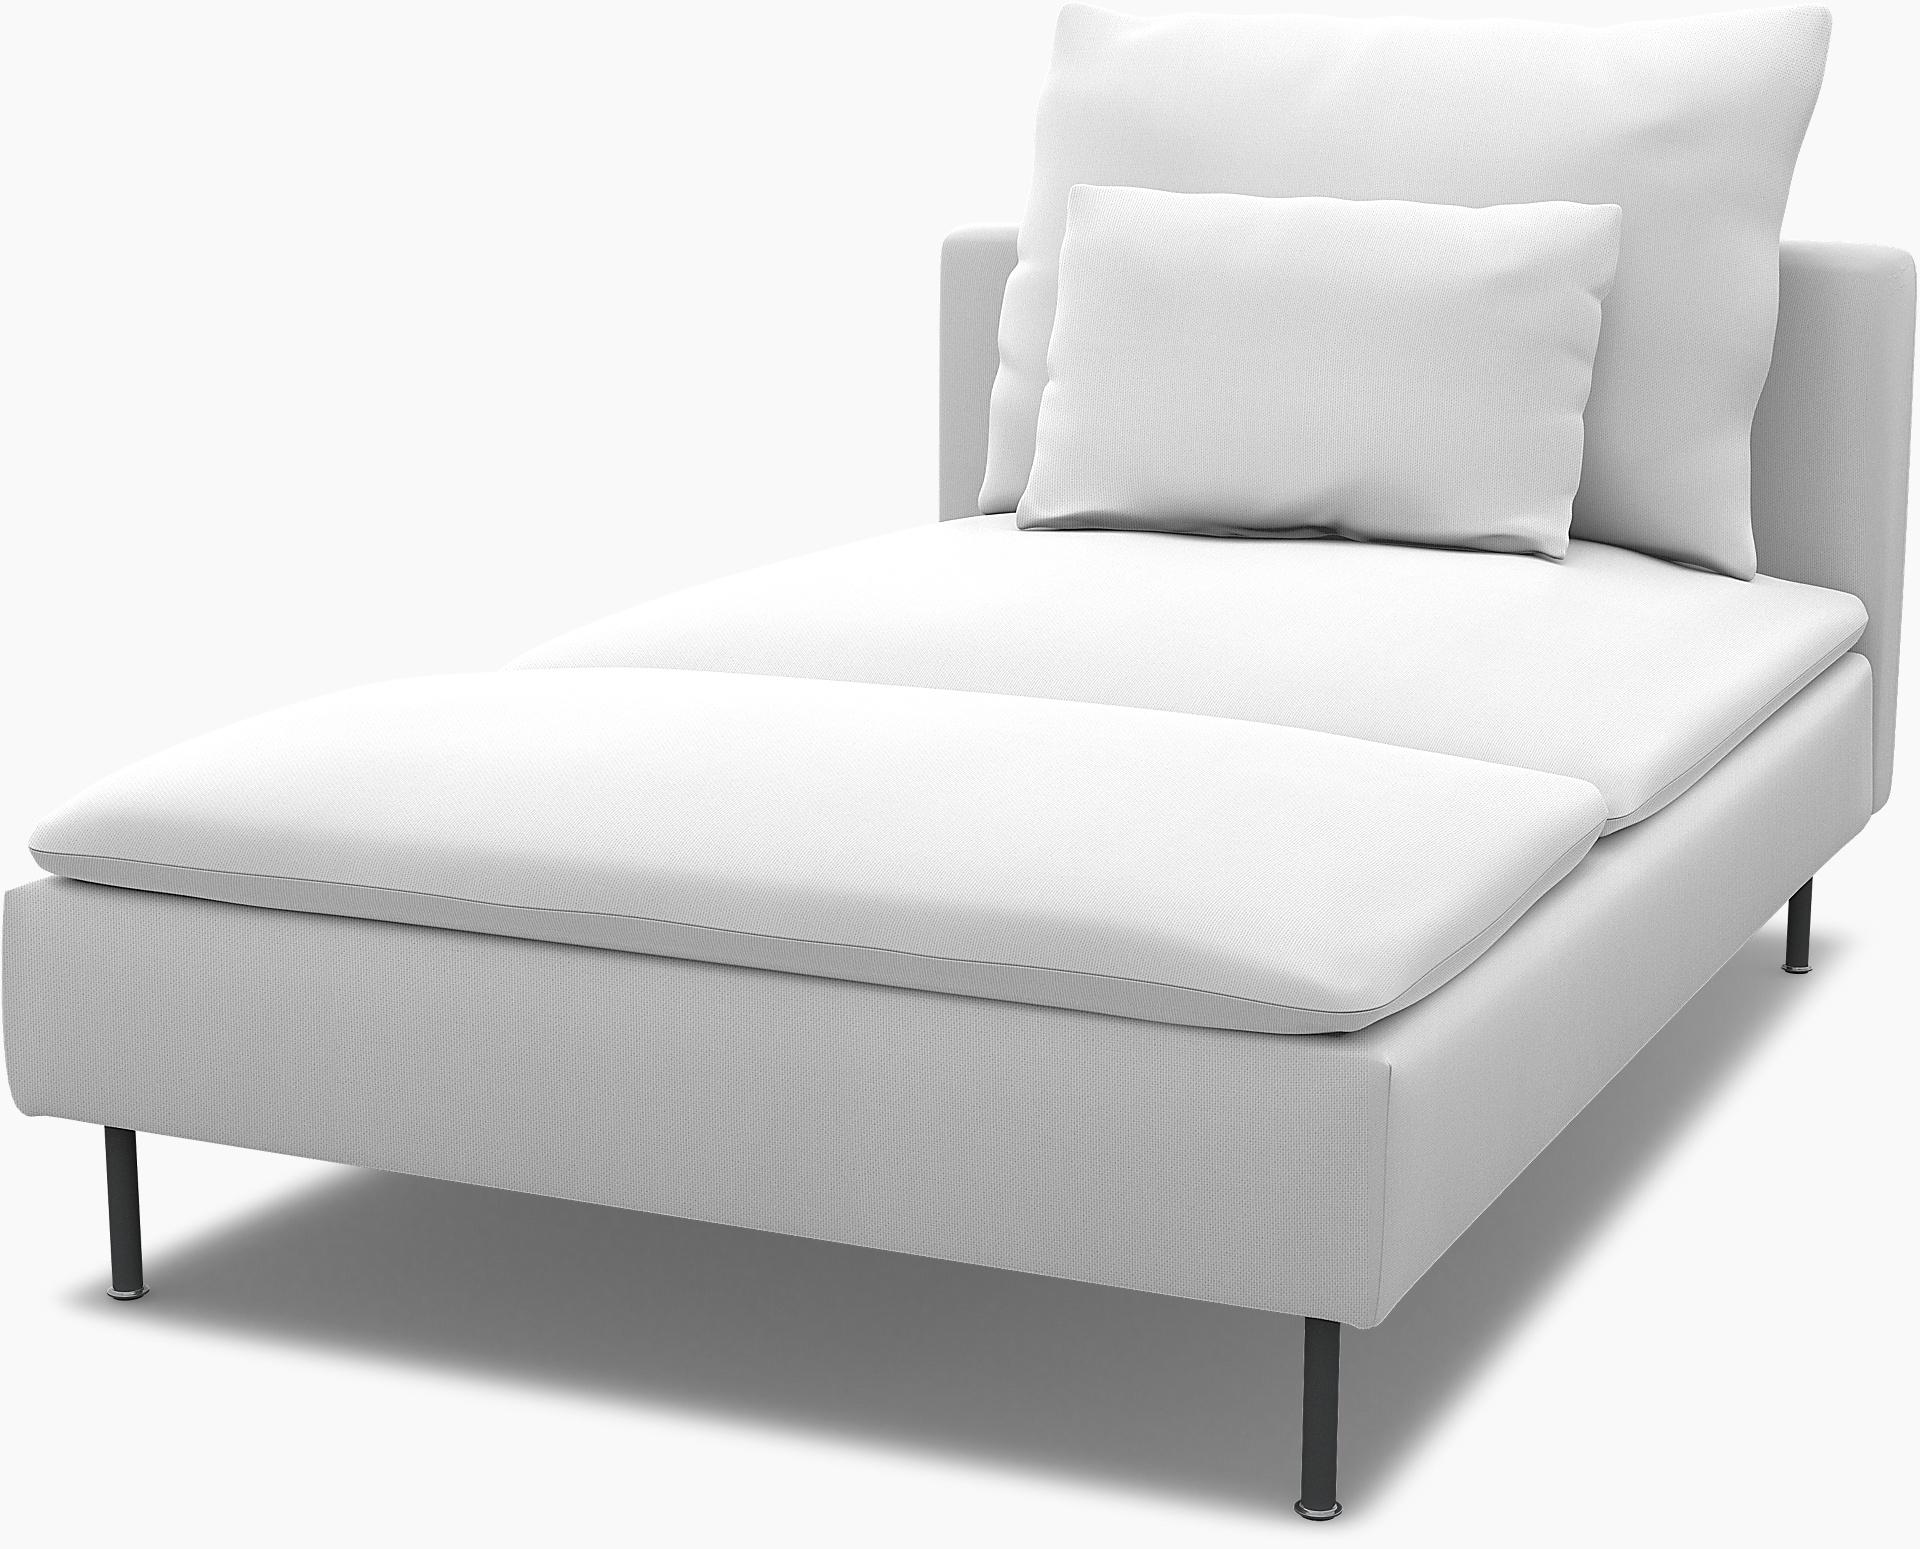 Sofa Chaise Longue Ikea.Ikea Soderhamn Chaise Longue Cover Bemz Bemz